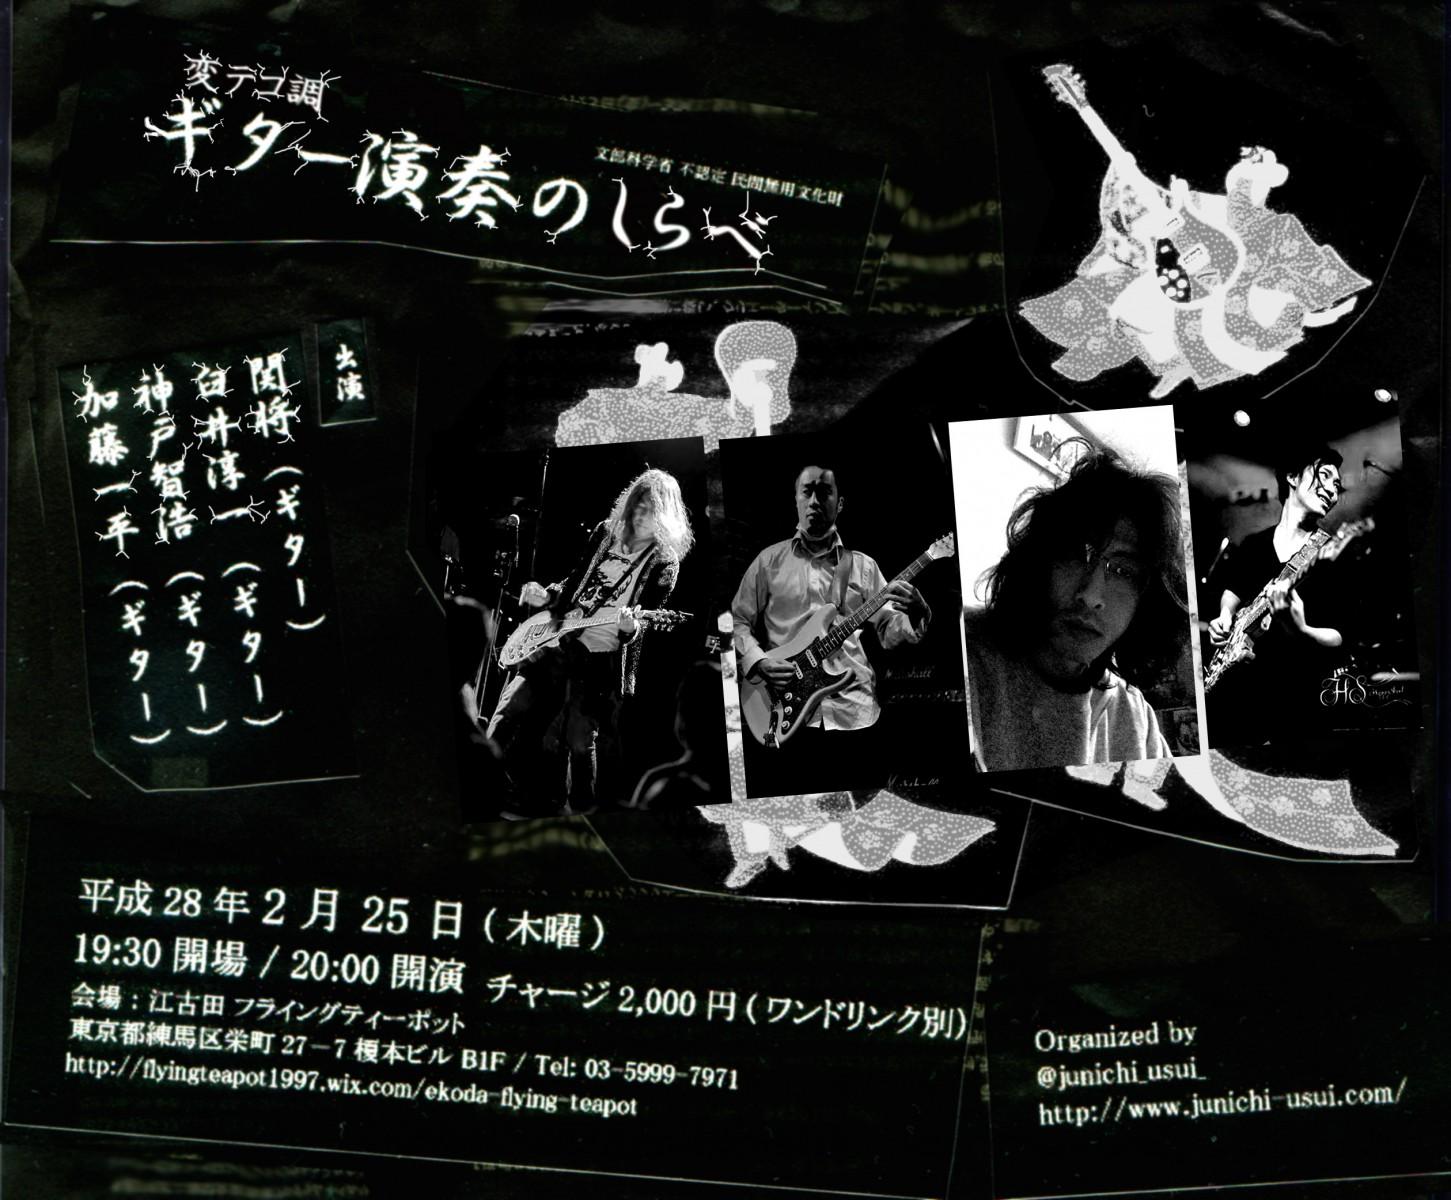 Show SEKI, Junichi USUI, Tomohiro KANBE, Ippei KATOU / Guitar session